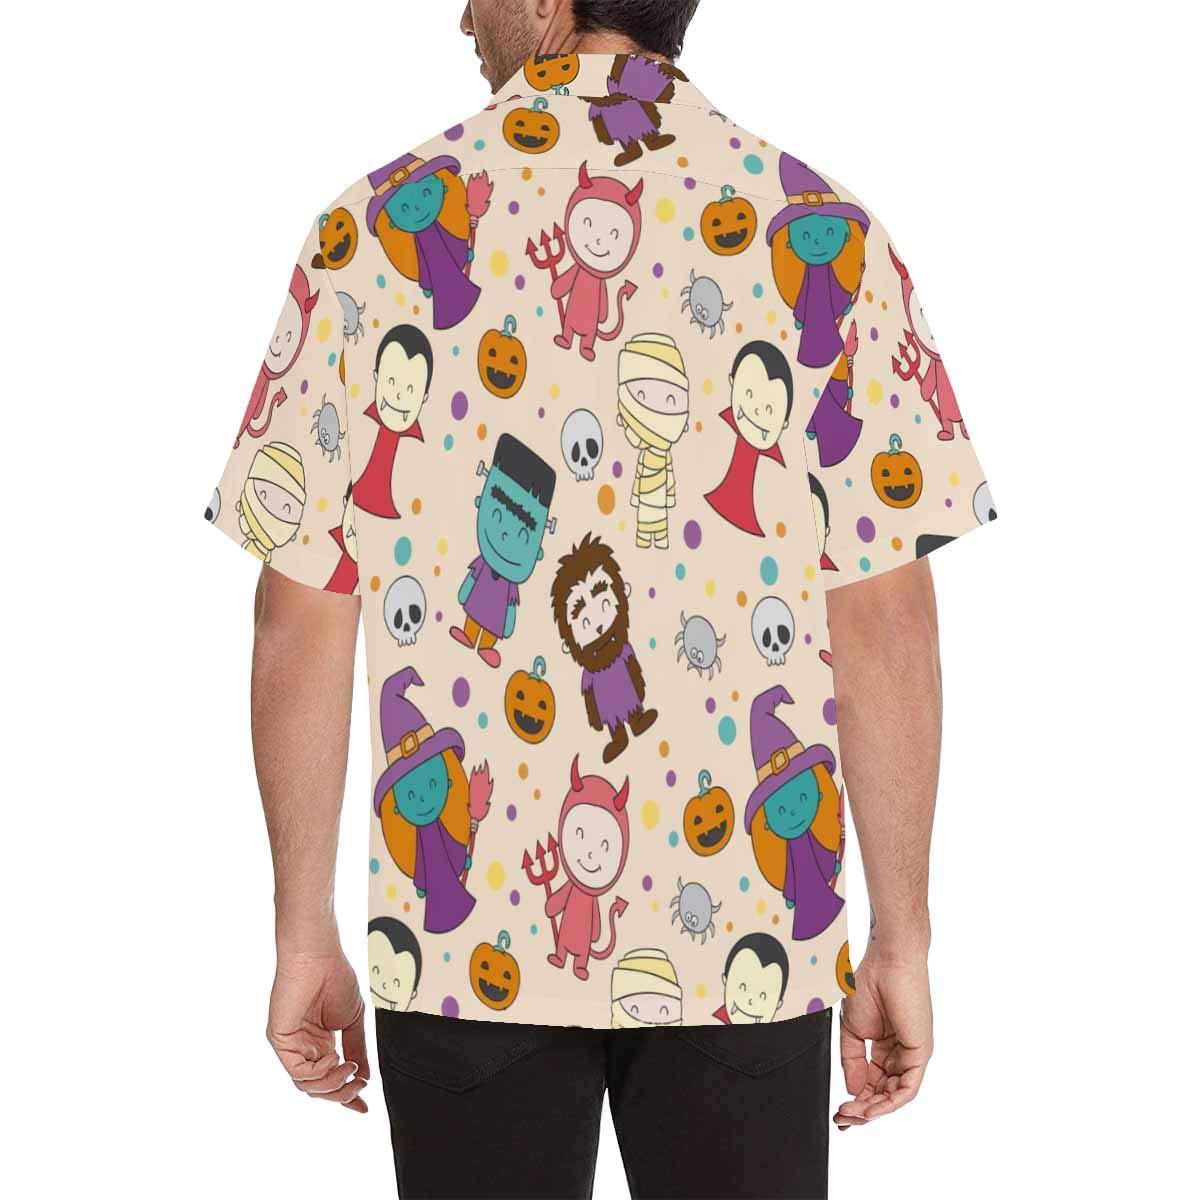 InterestPrint Mens Pegasus Space Tees Tops T-Shirts